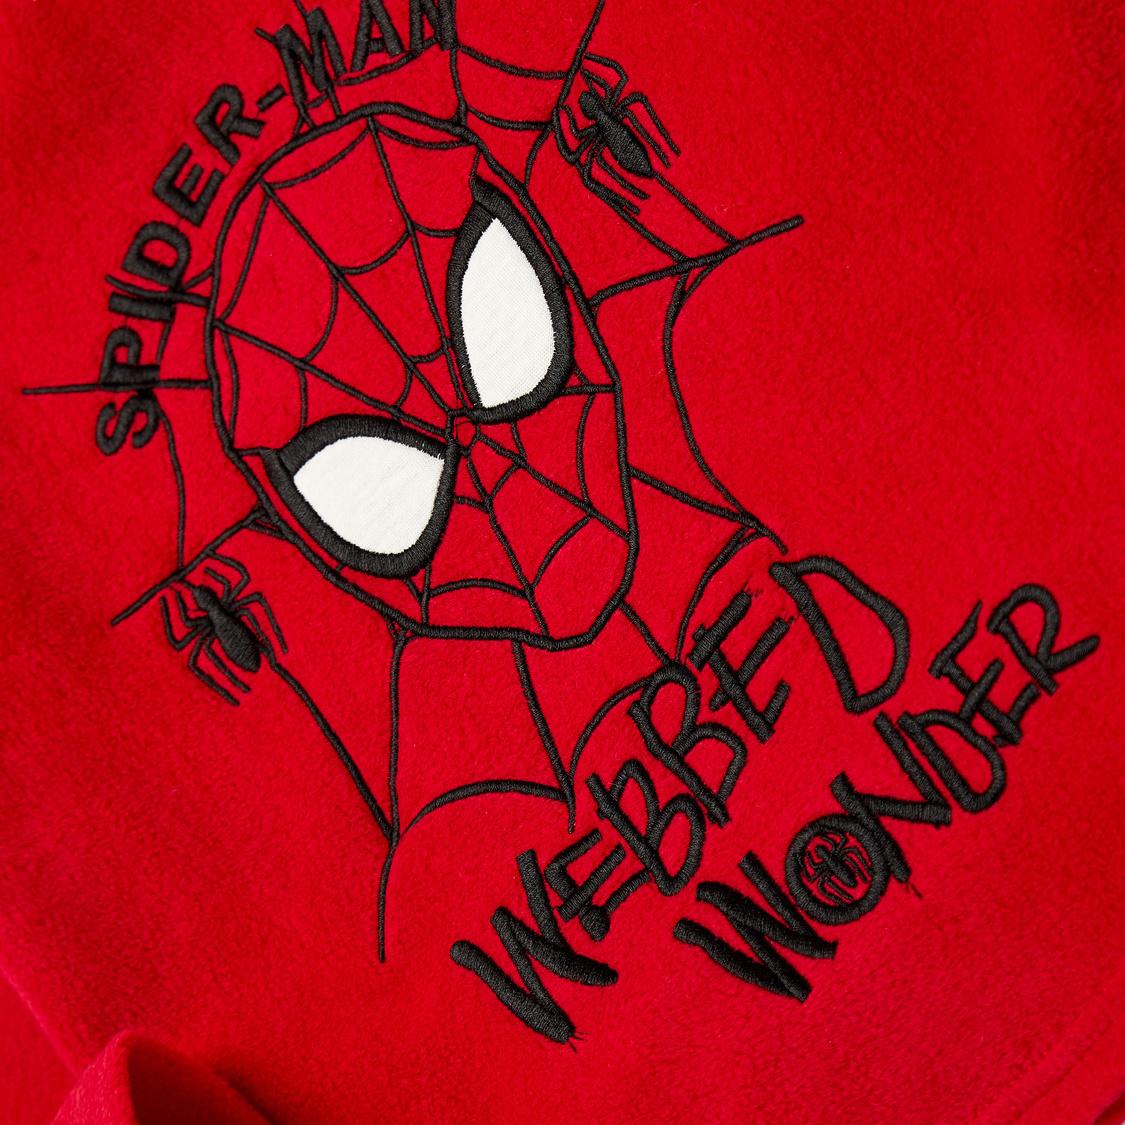 Spider-Man Print T-shirt and Full Length Pyjama Set